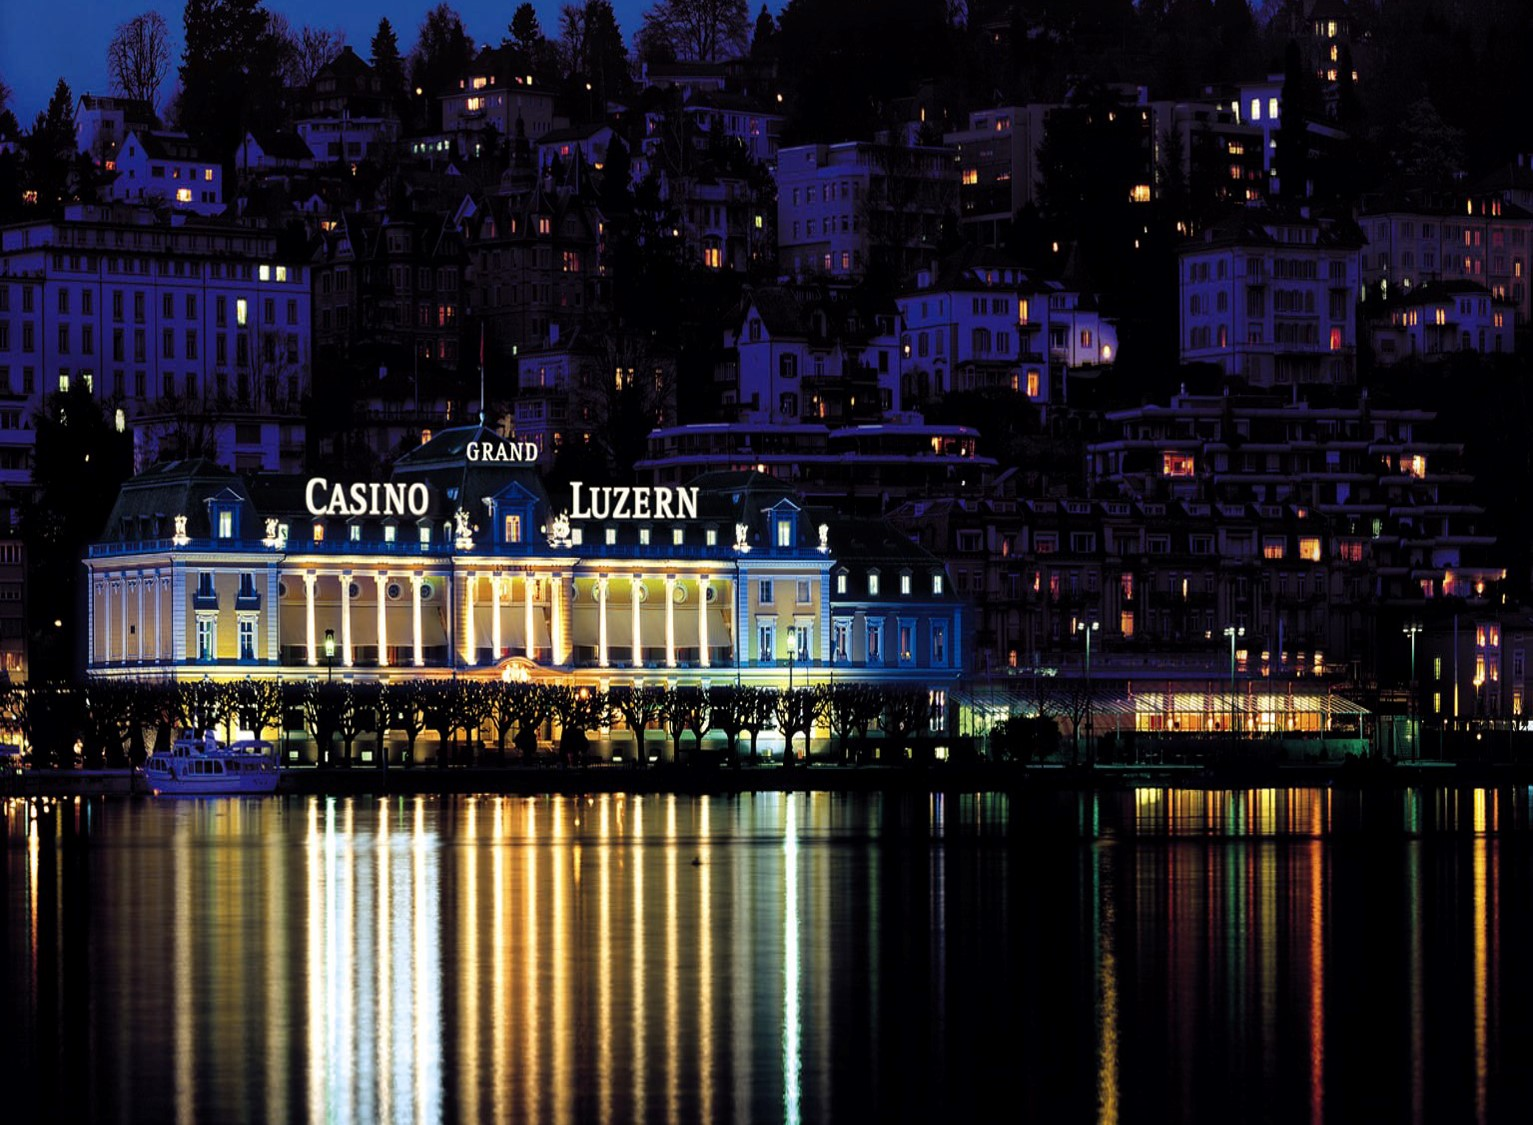 Grand Casino Club Luzern